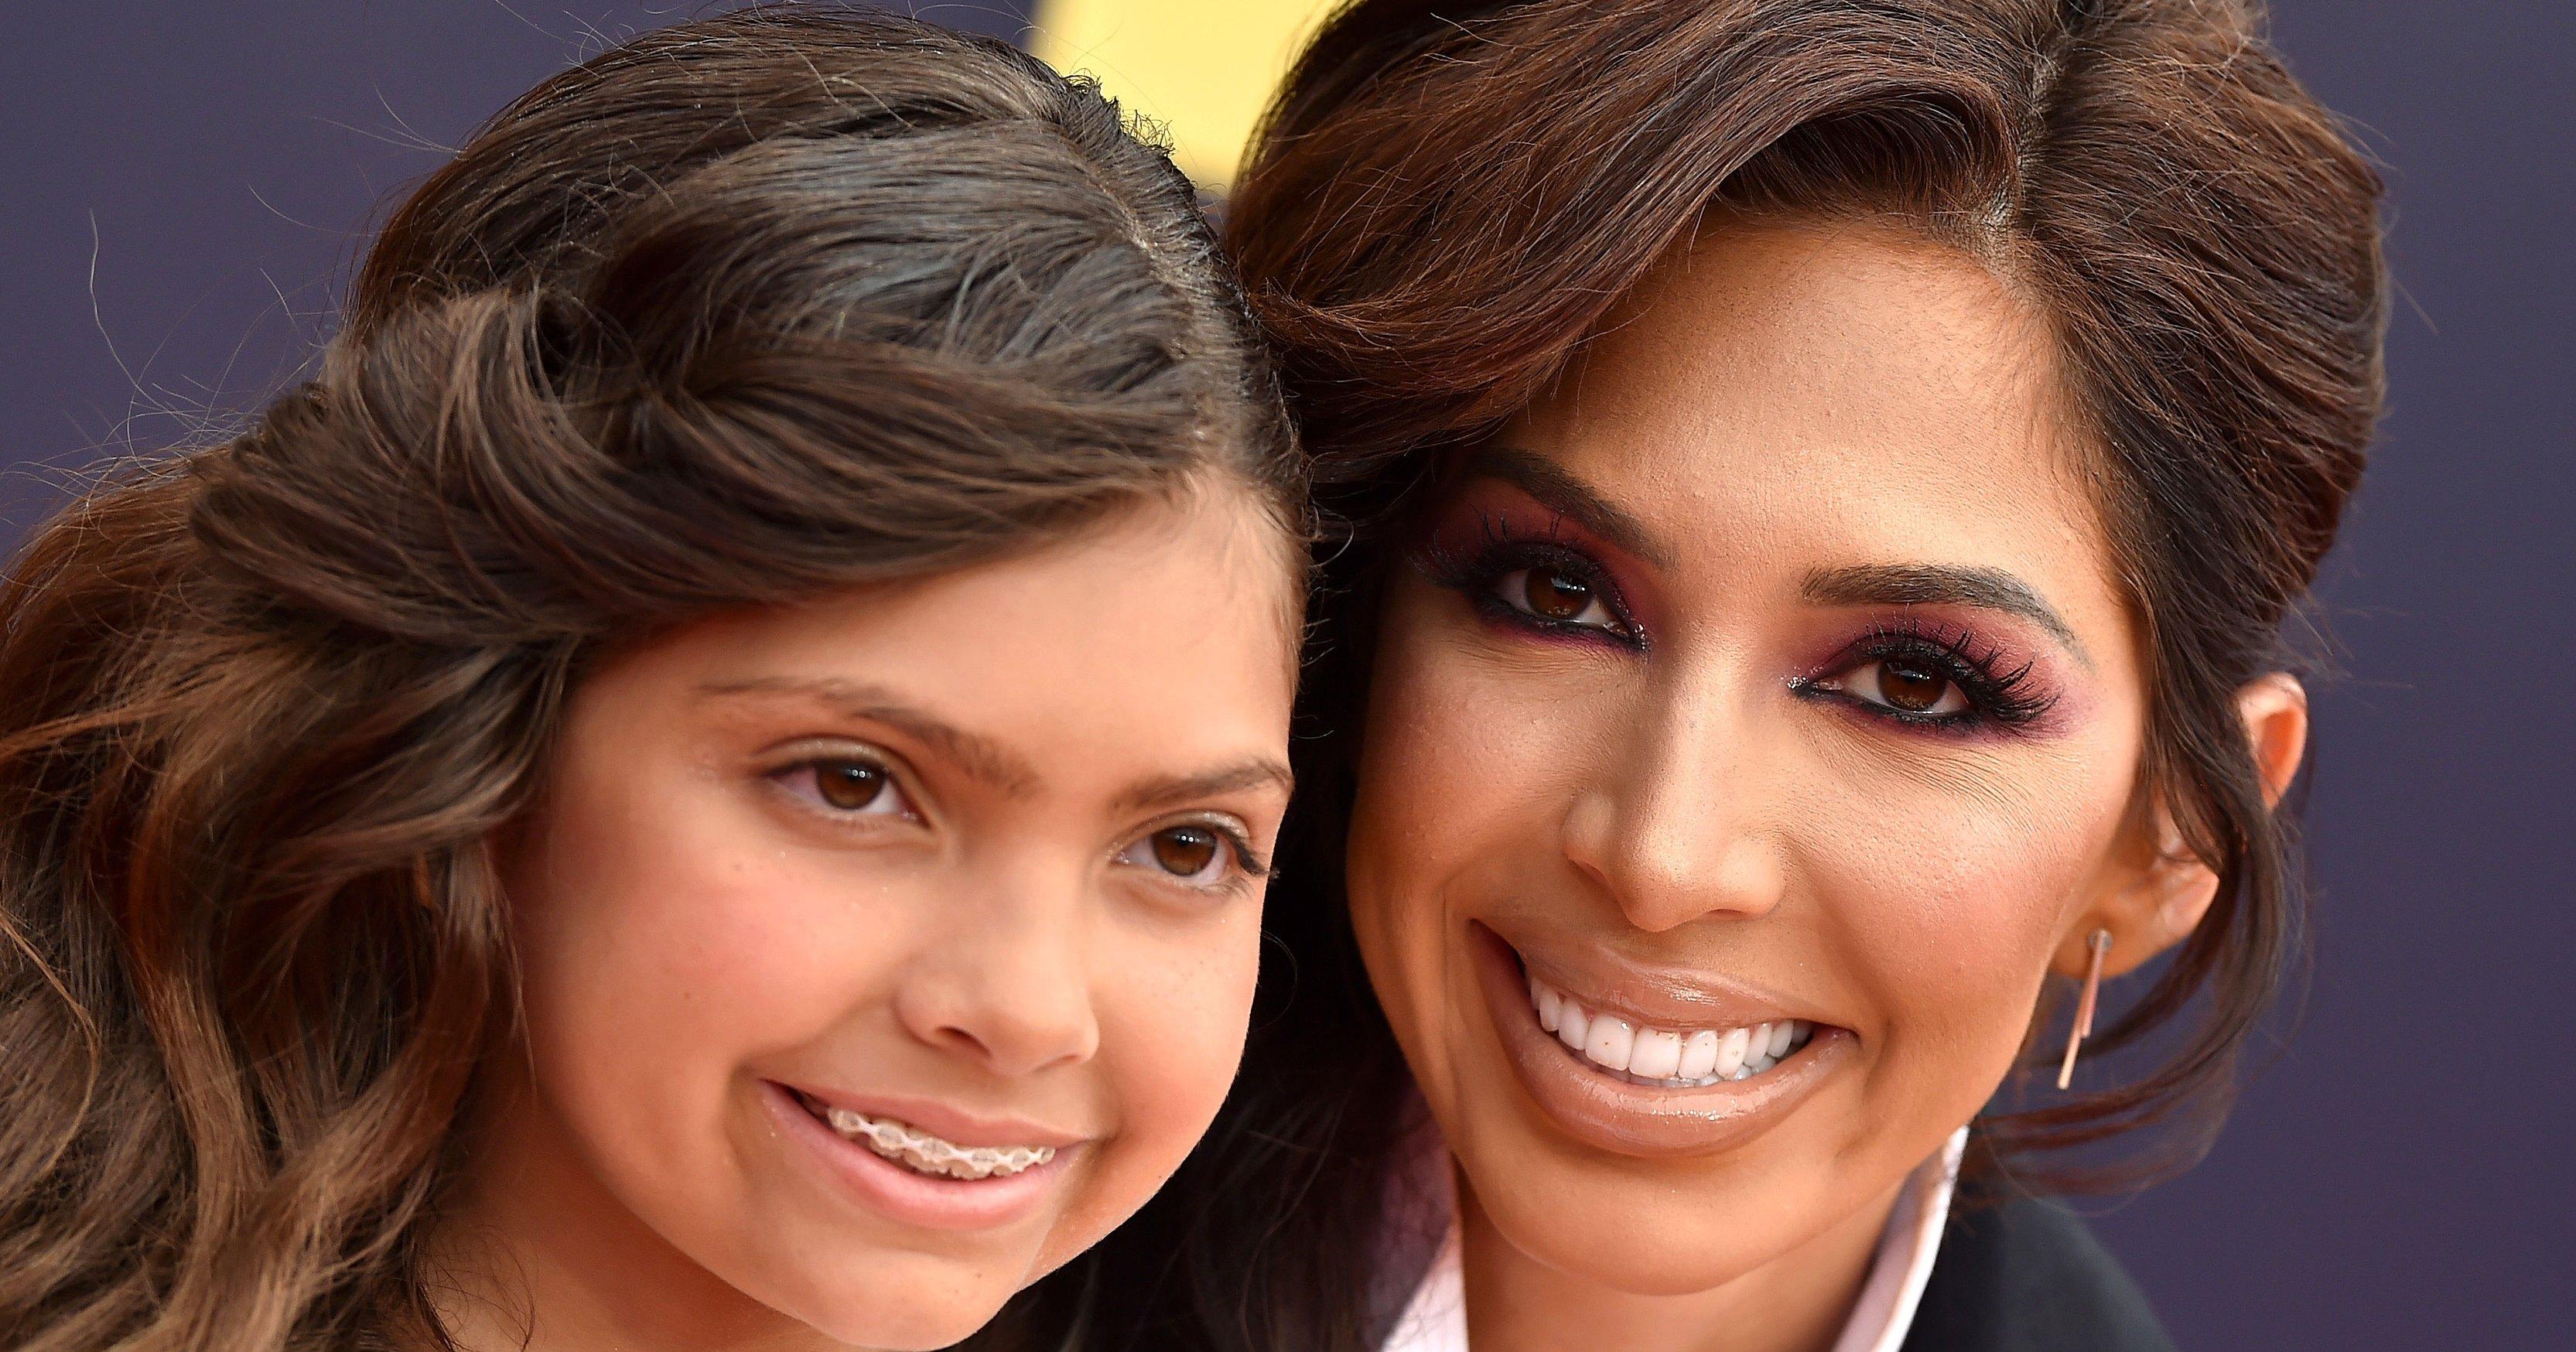 Farrah Abraham Defends Video of Daughter, 9, Dancing in Underwear